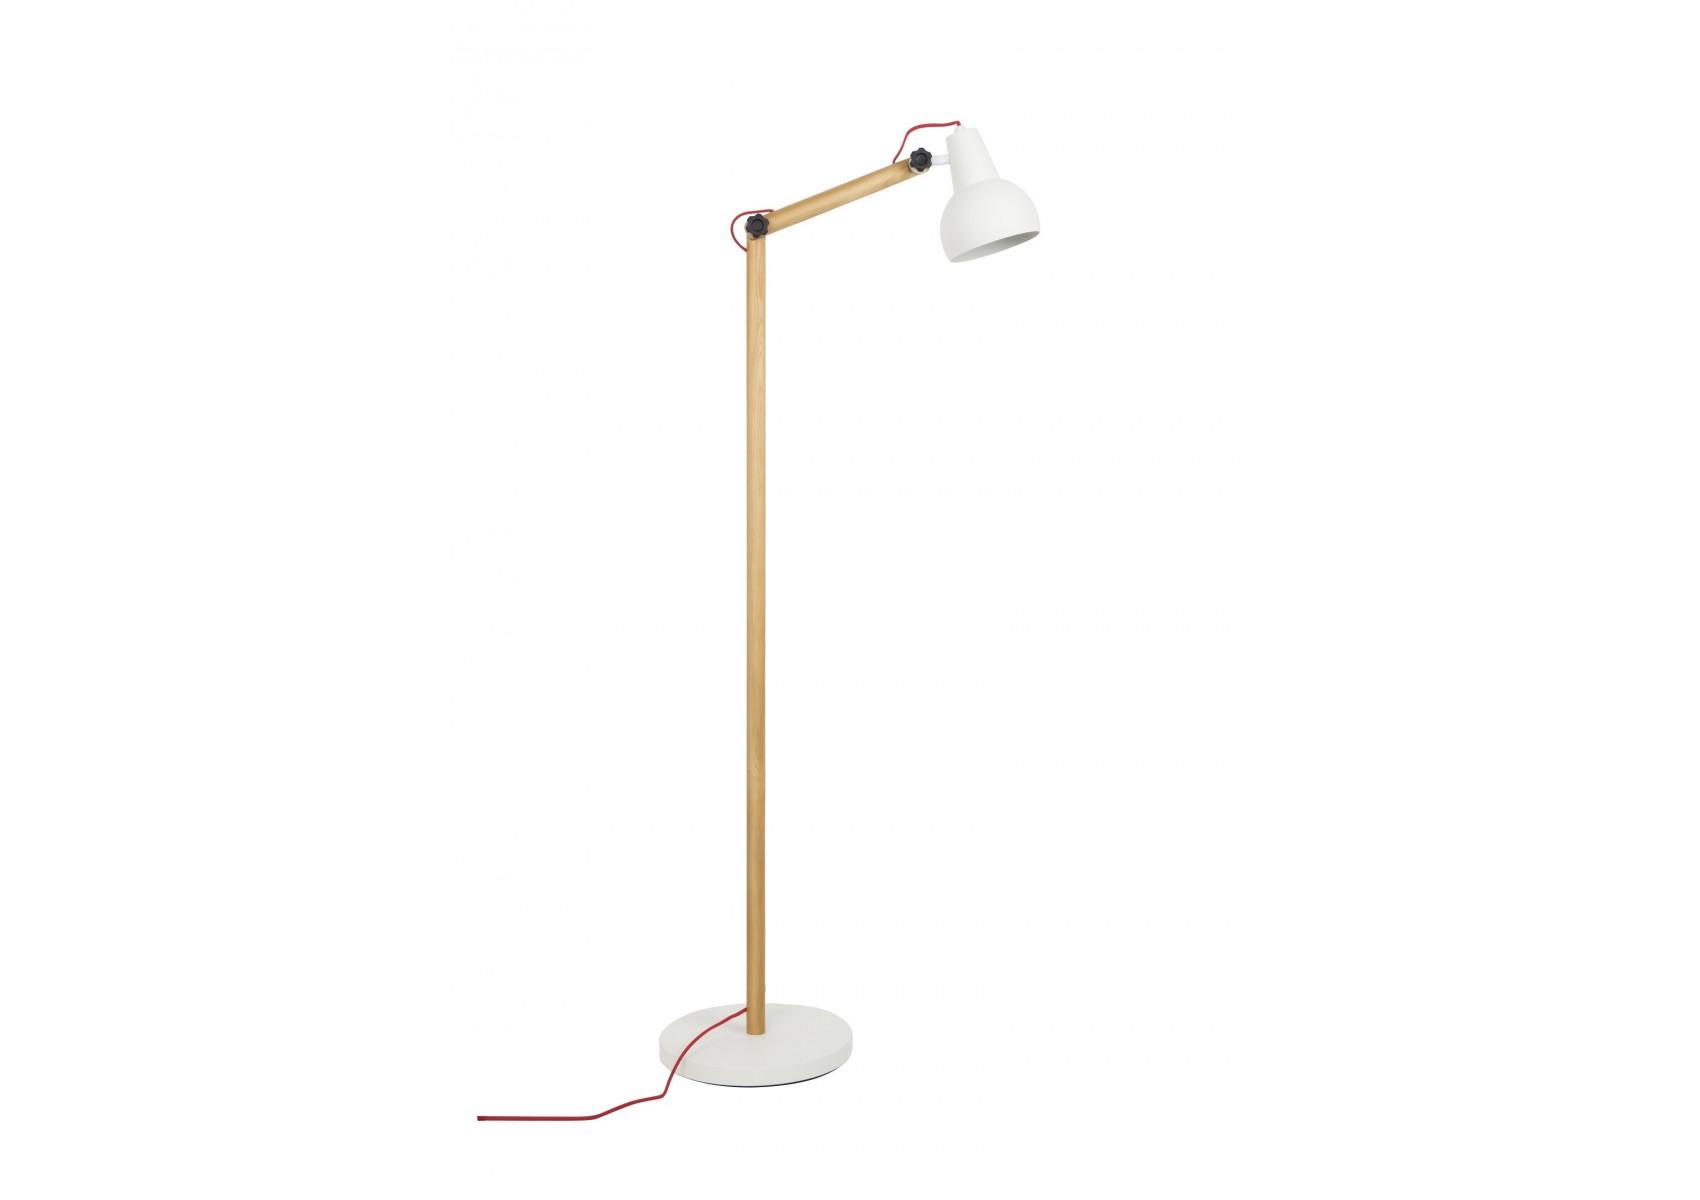 lampadaire design study deco zuiver boite design. Black Bedroom Furniture Sets. Home Design Ideas